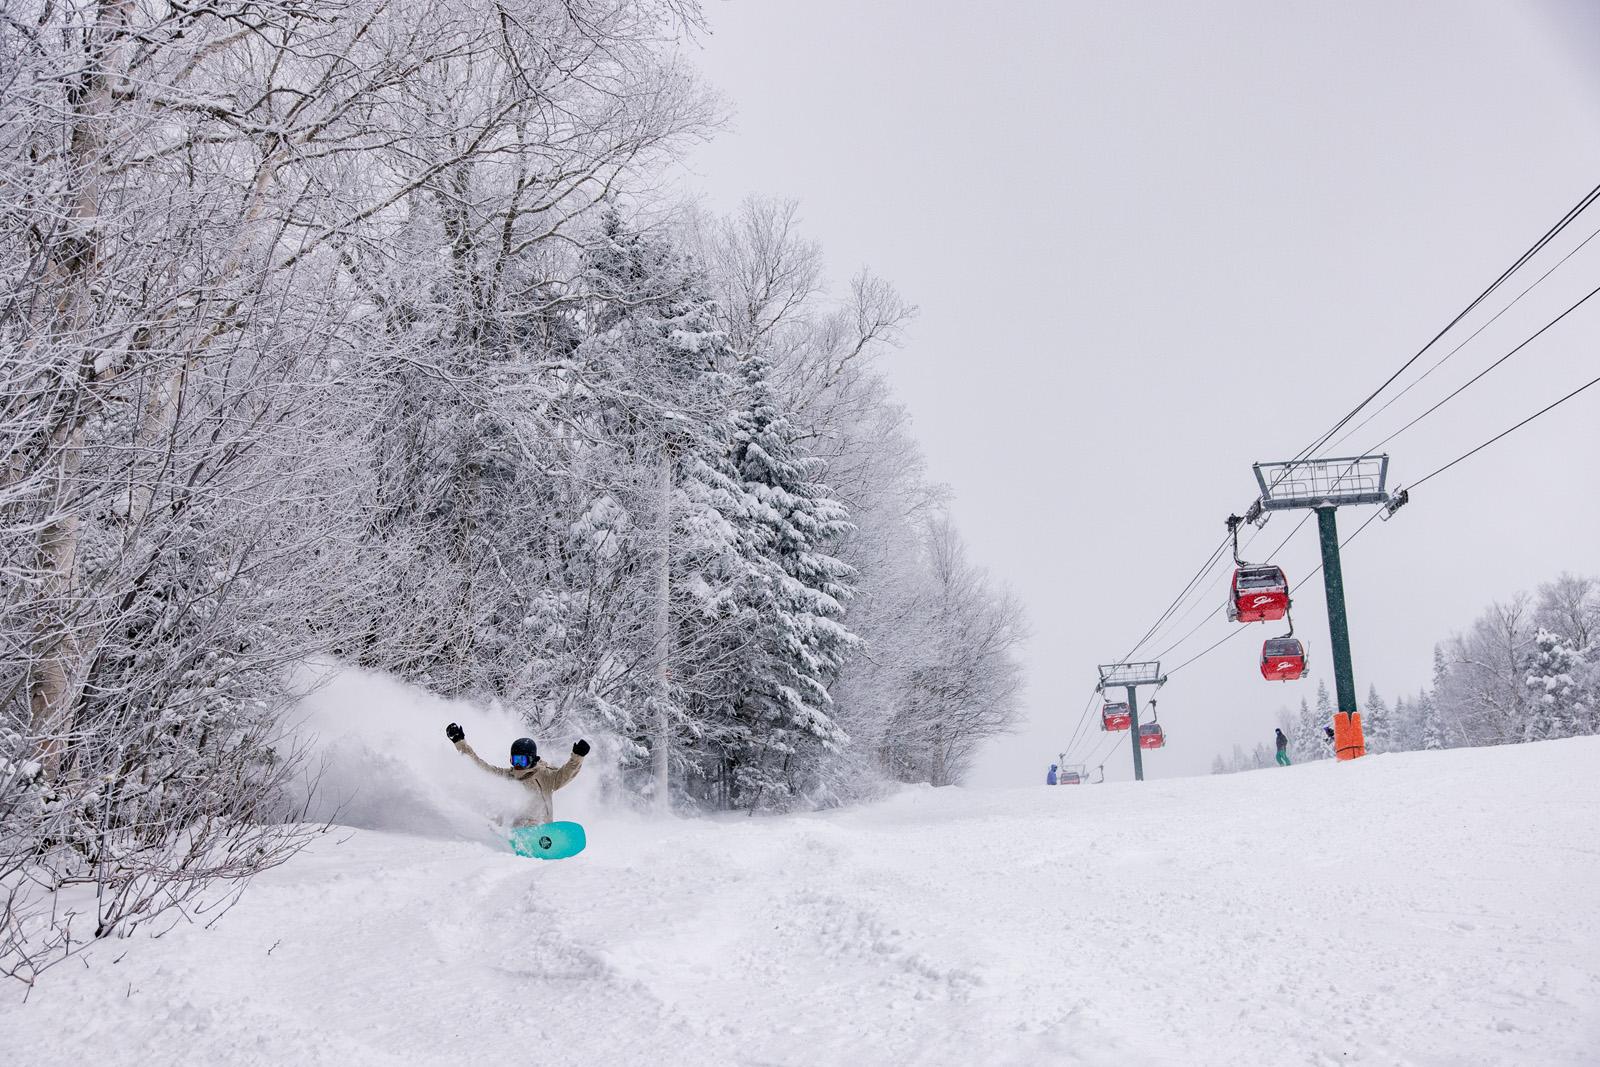 Neil Soucy, Stowe Vermont, Burton snowboards